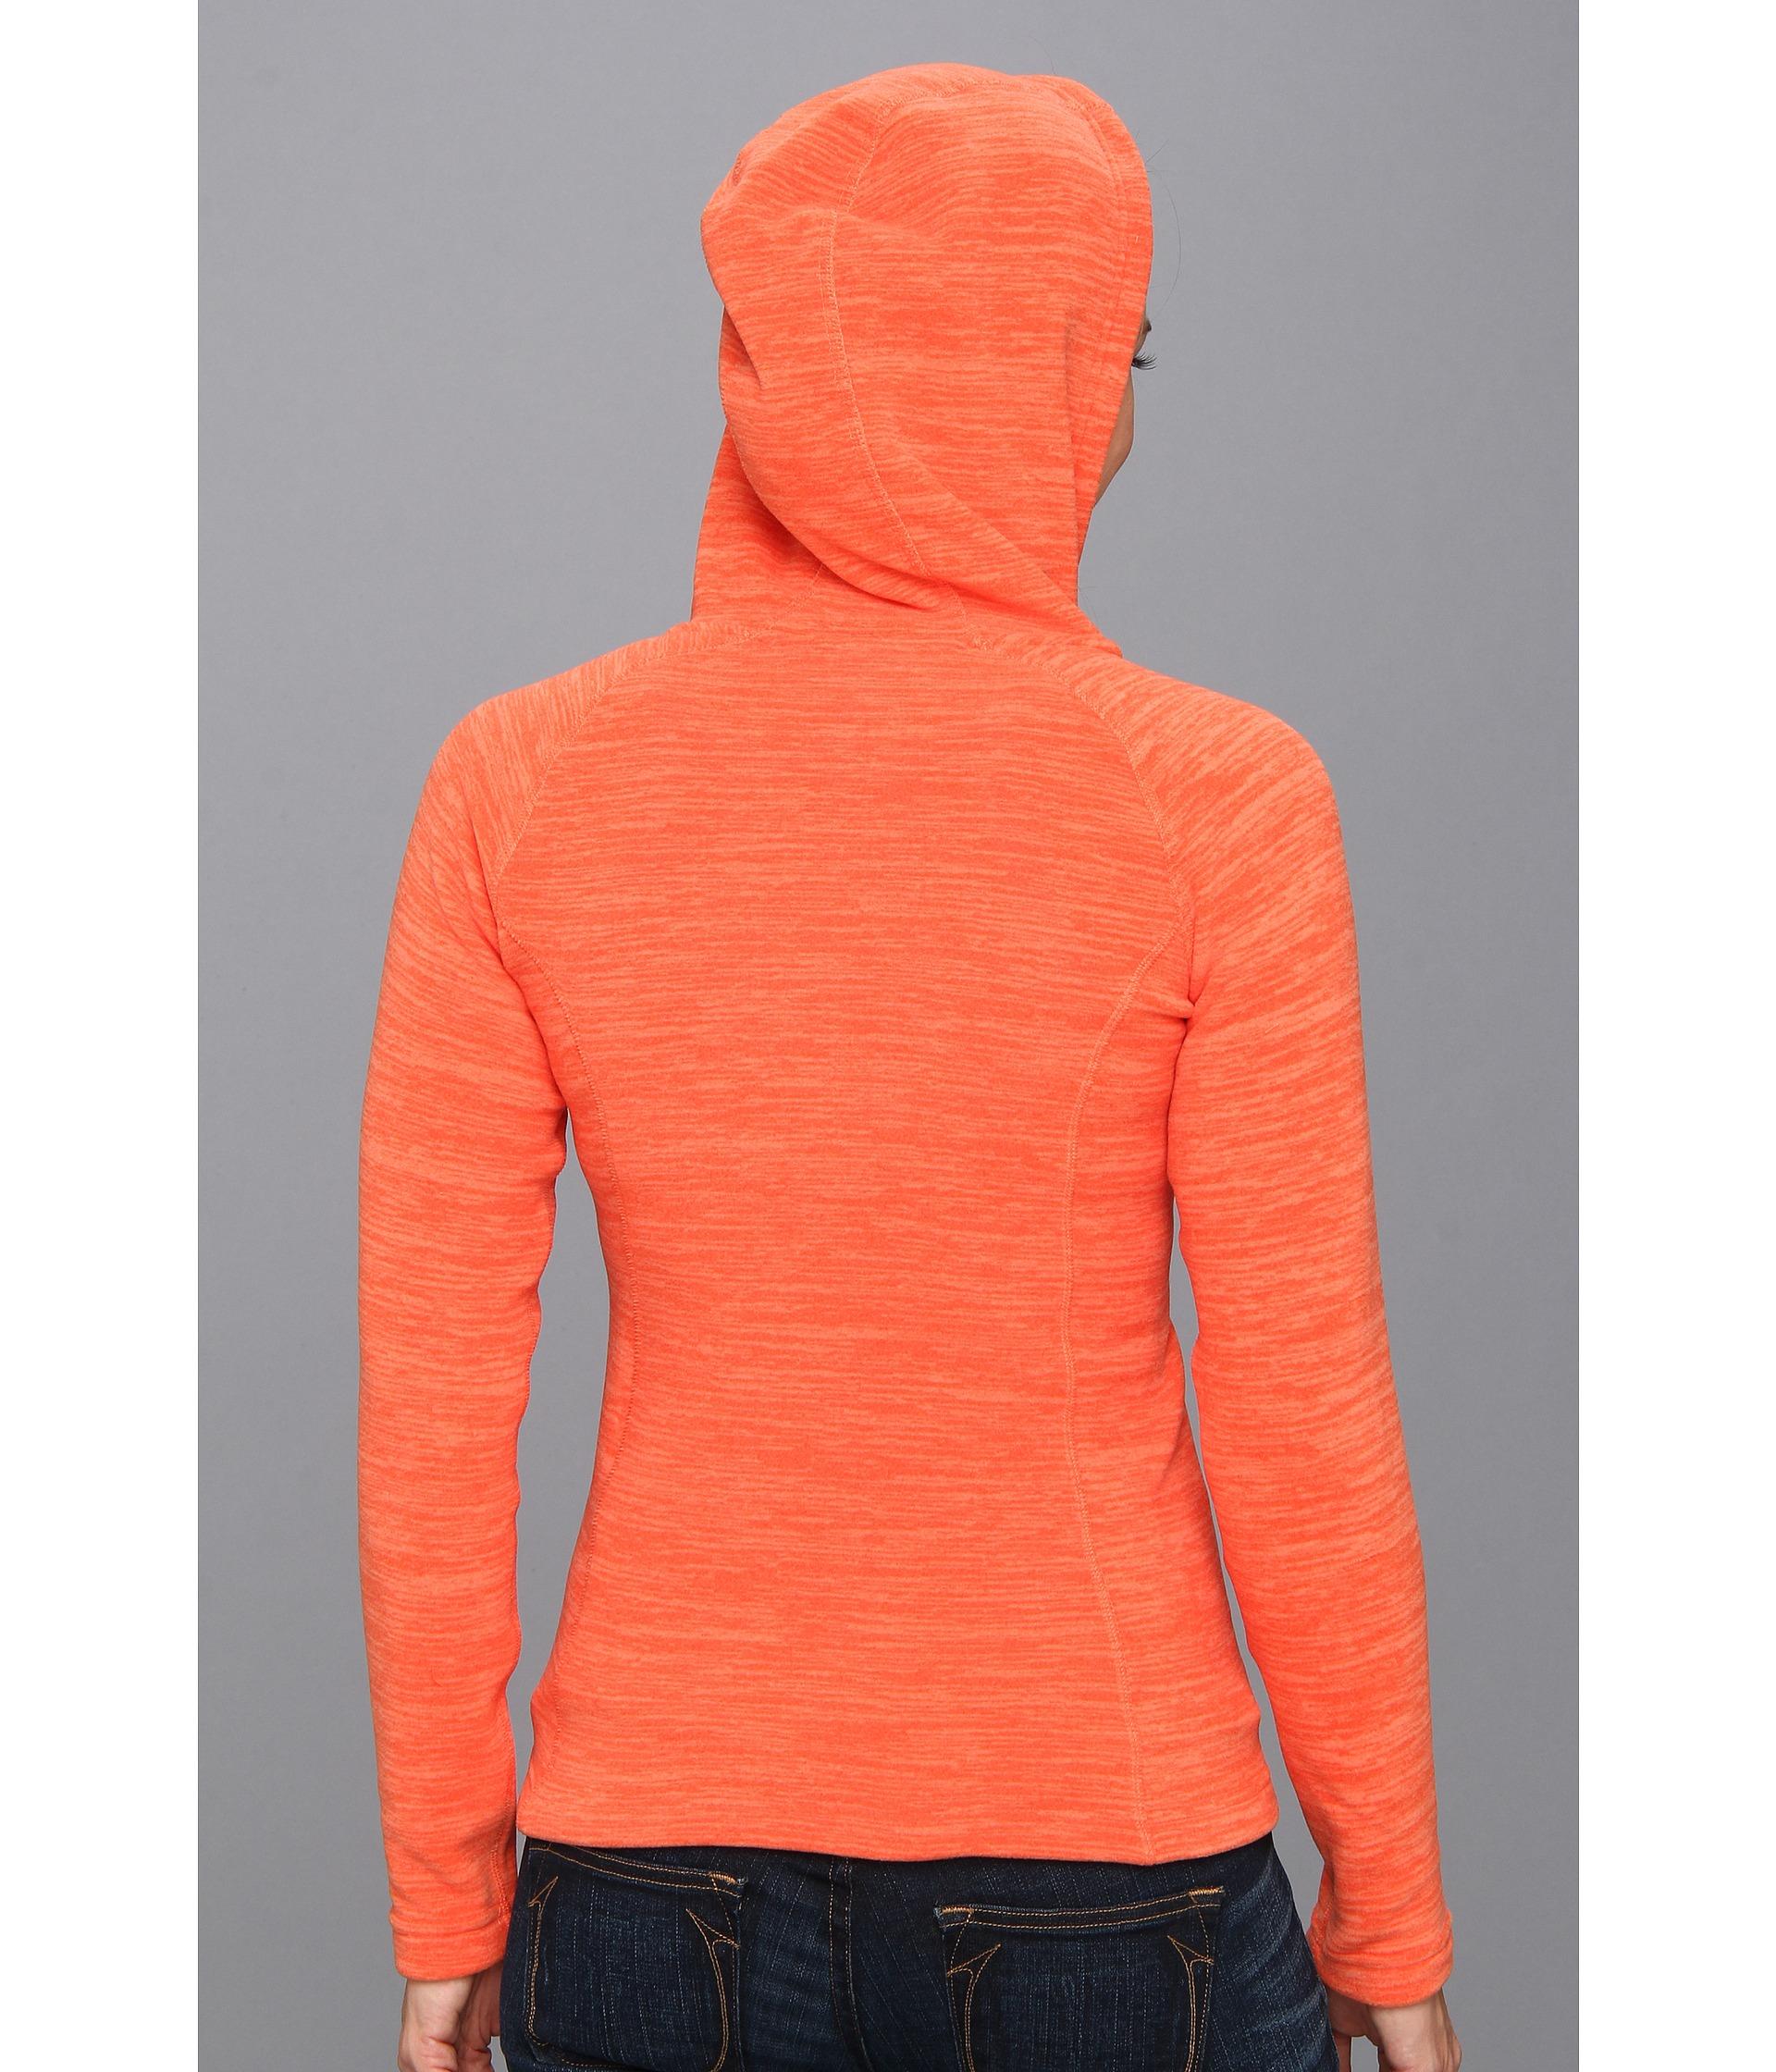 05923b68b The North Face Orange Stria Mezzaluna Hoodie